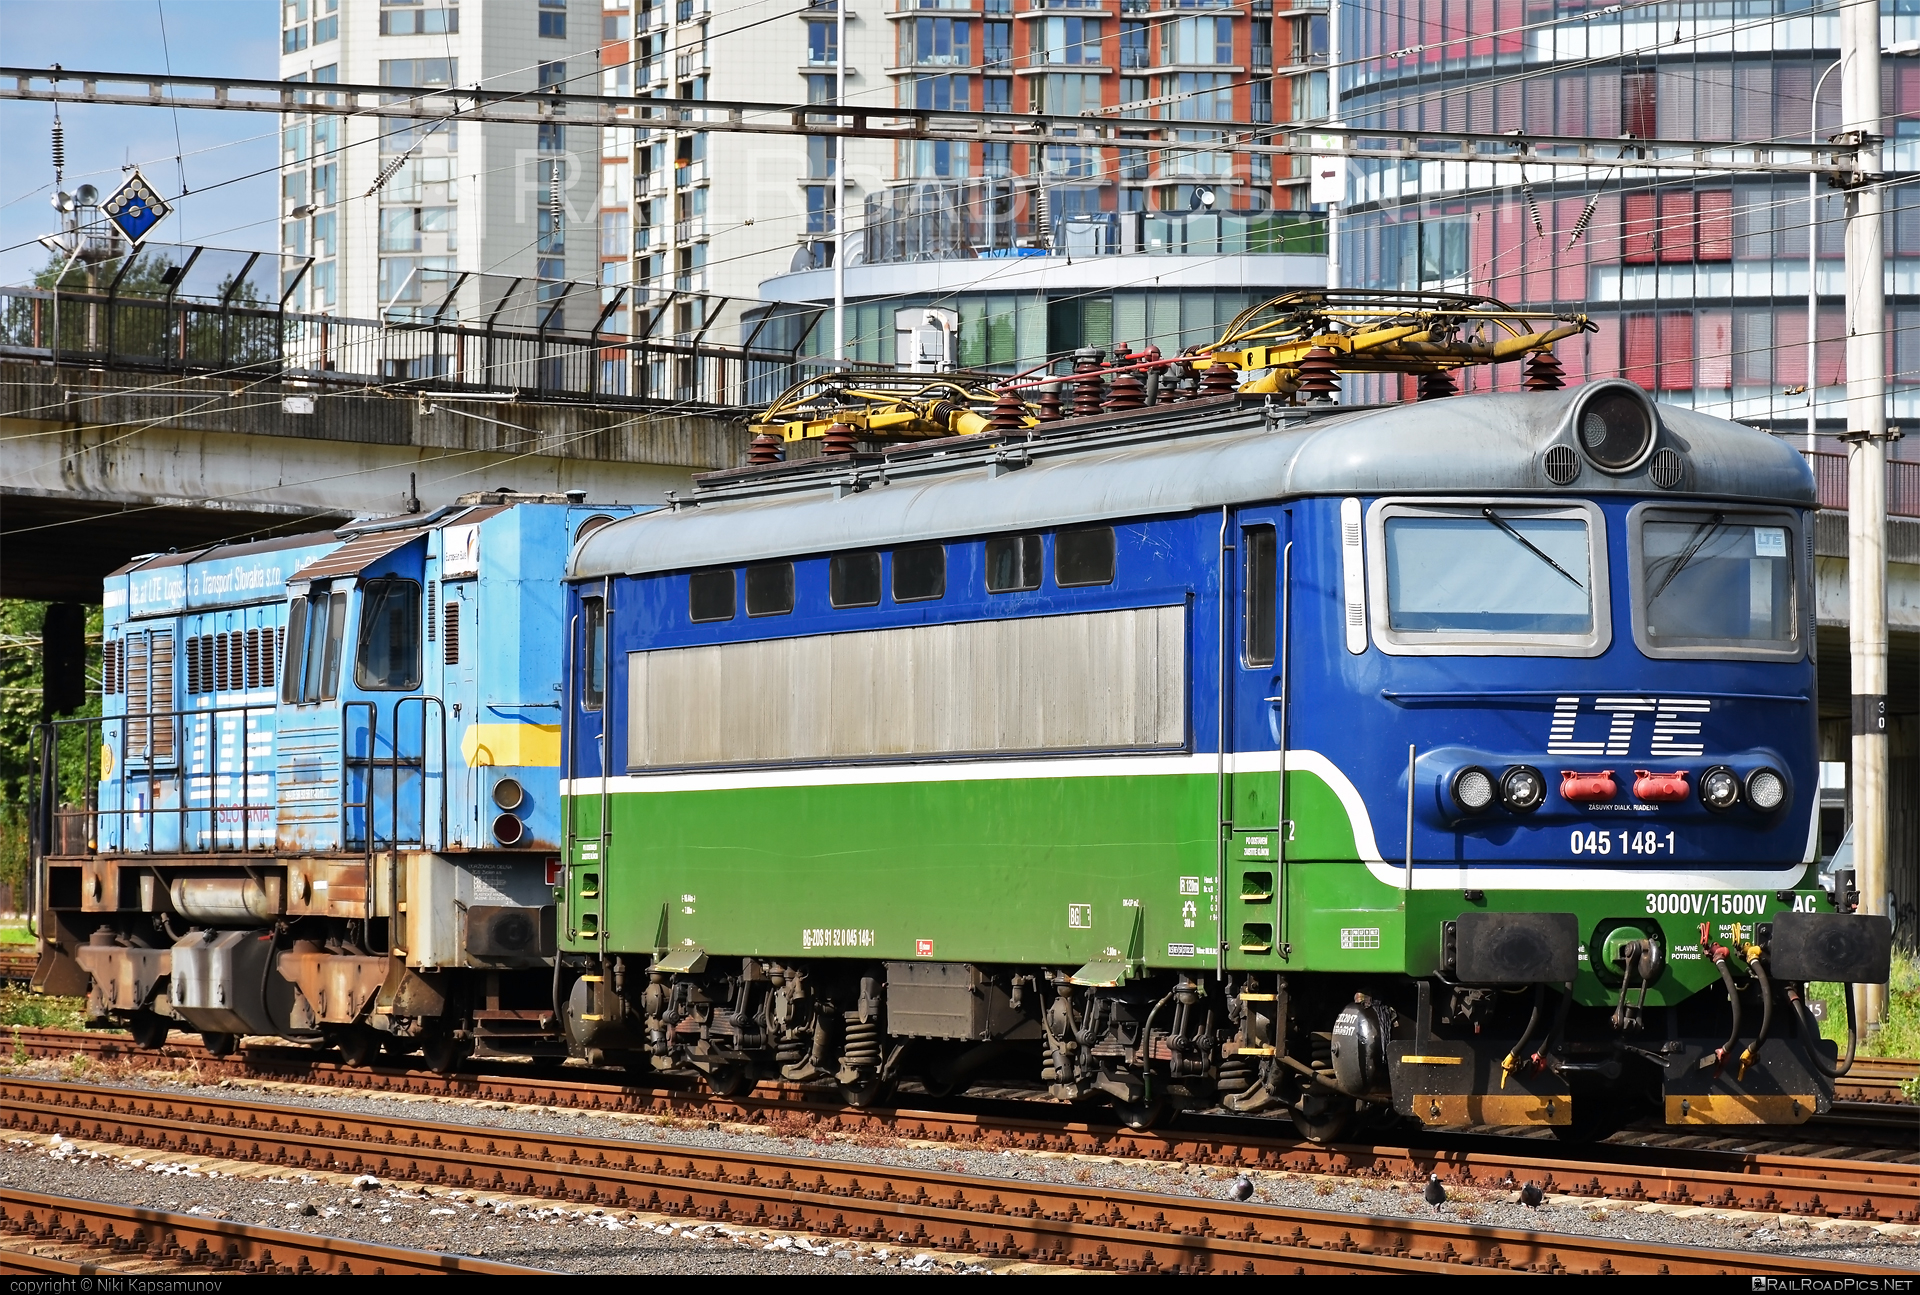 Škoda 73E - 045 148-1 operated by LTE Logistik a Transport Slovakia, s.r.o. #locomotive242 #plechac #skoda #skoda73e #zoszvolen